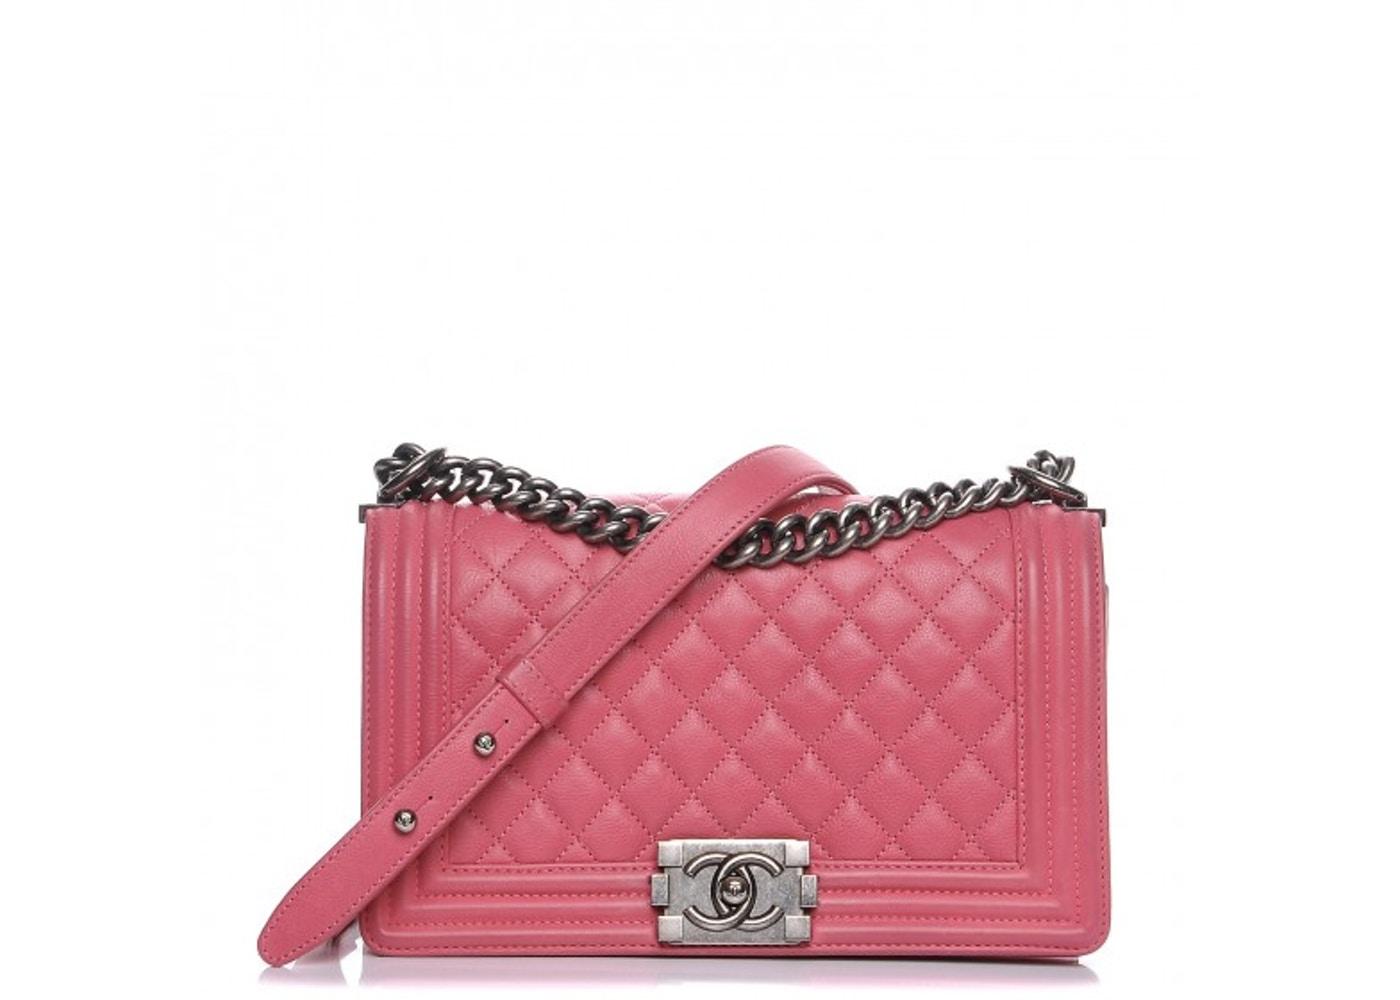 2d93904d6e8297 A Comprehensive Look at Nicki Minaj's Designer Bag Collection ...